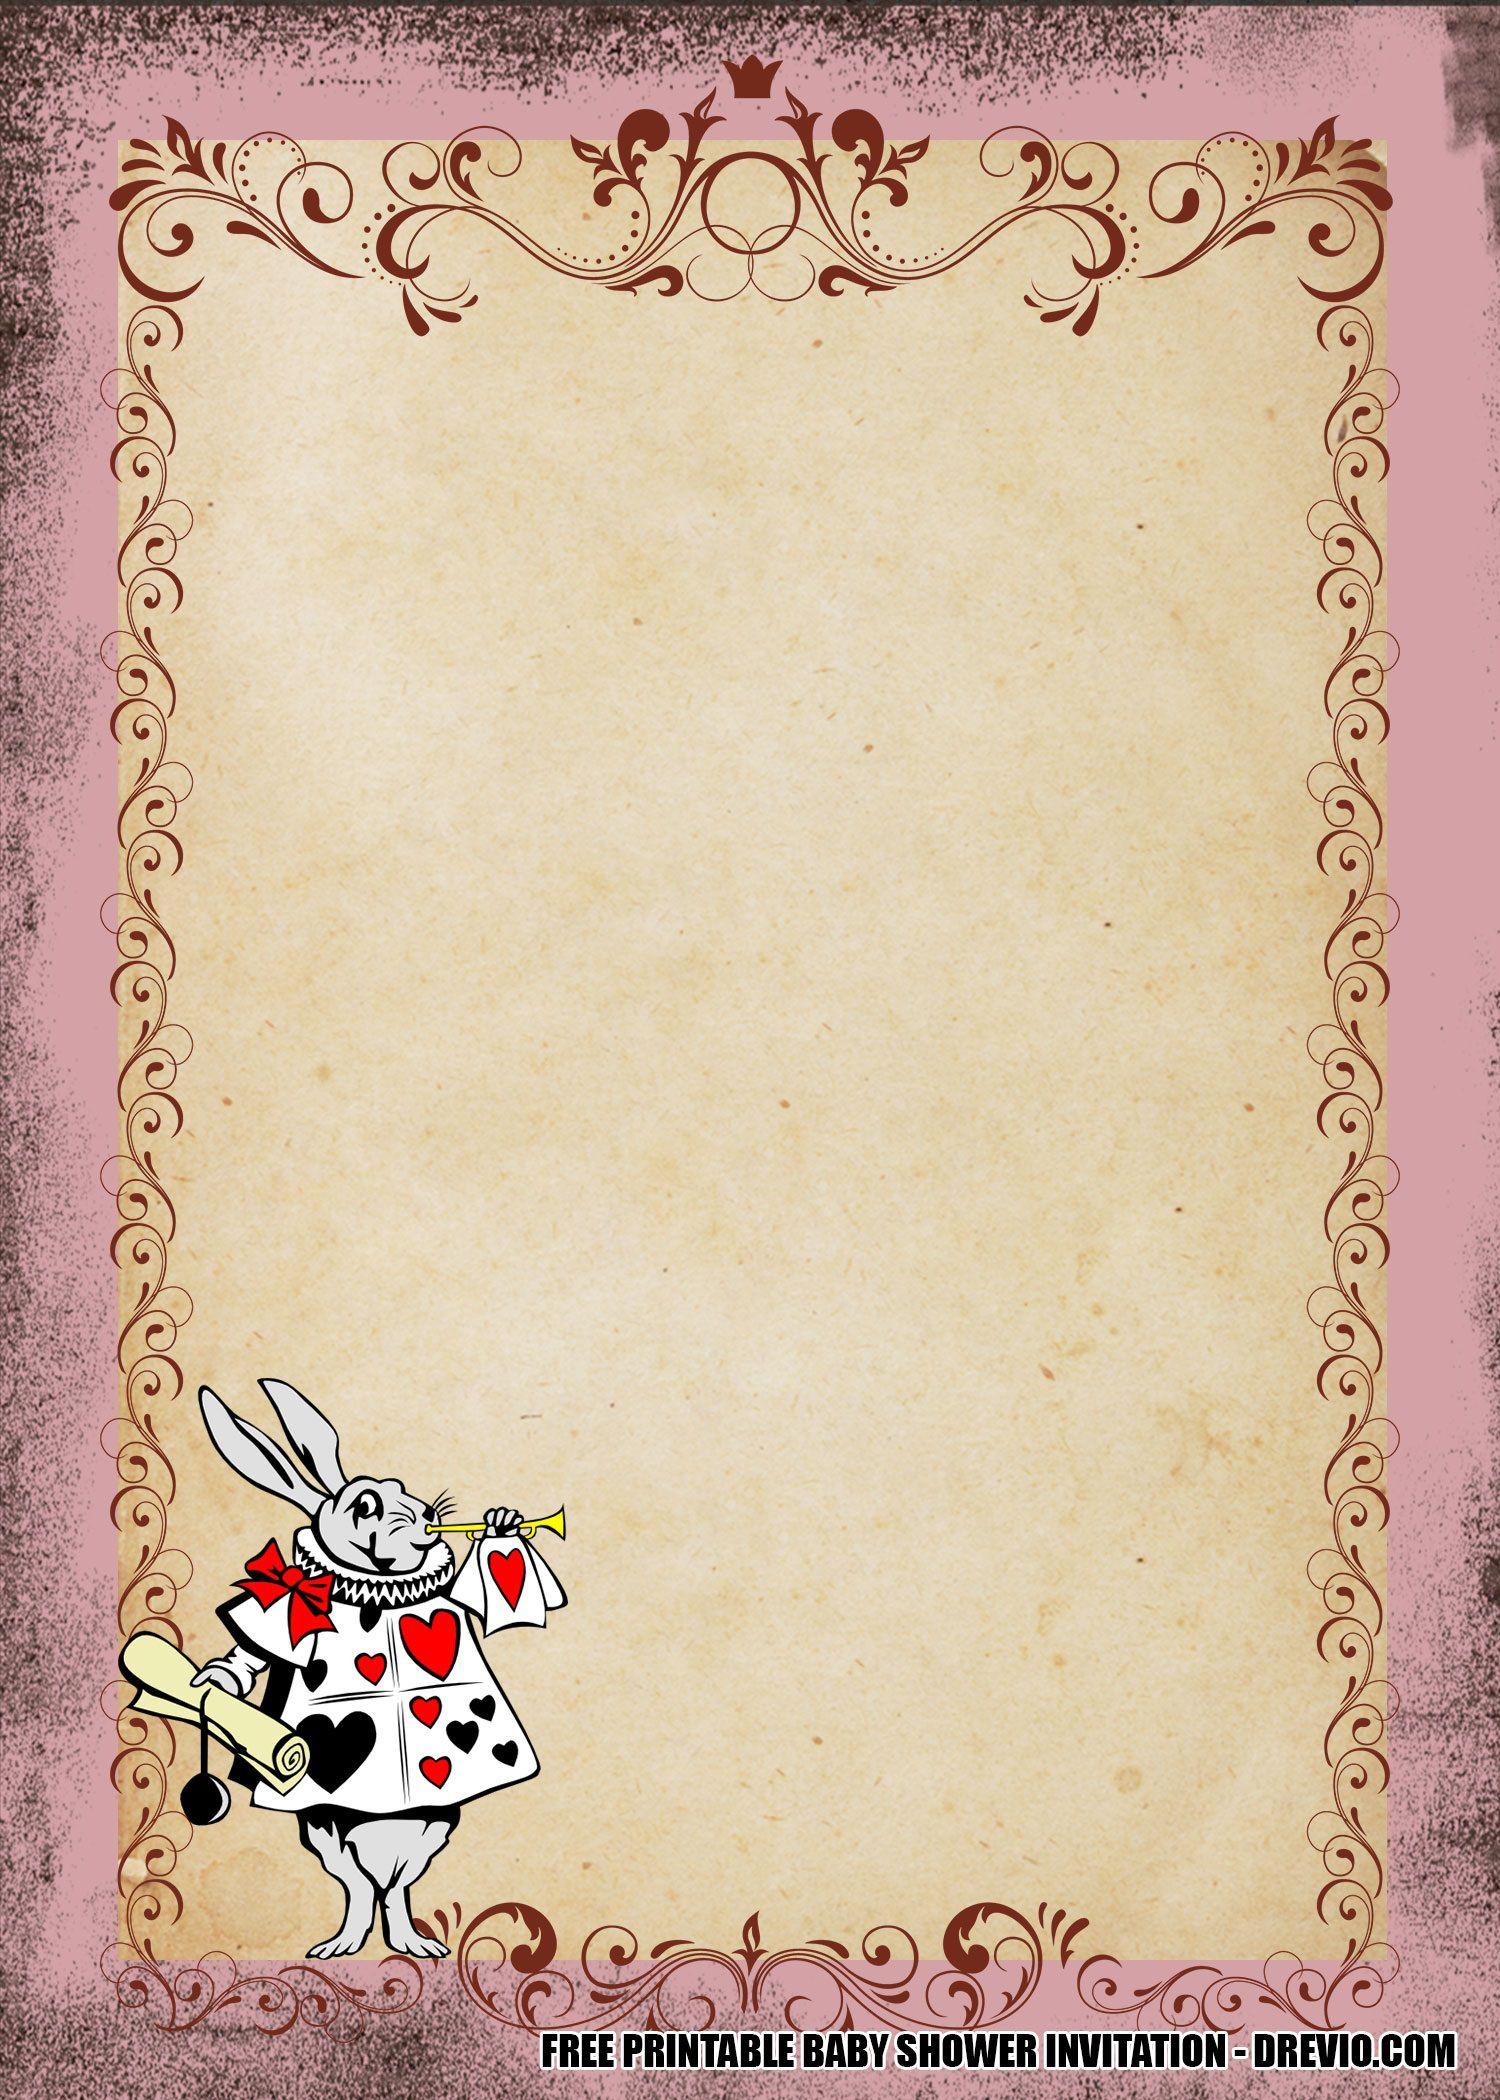 008 Imposing Alice In Wonderland Invitation Template High Resolution  Templates Wedding Birthday Free Tea PartyFull